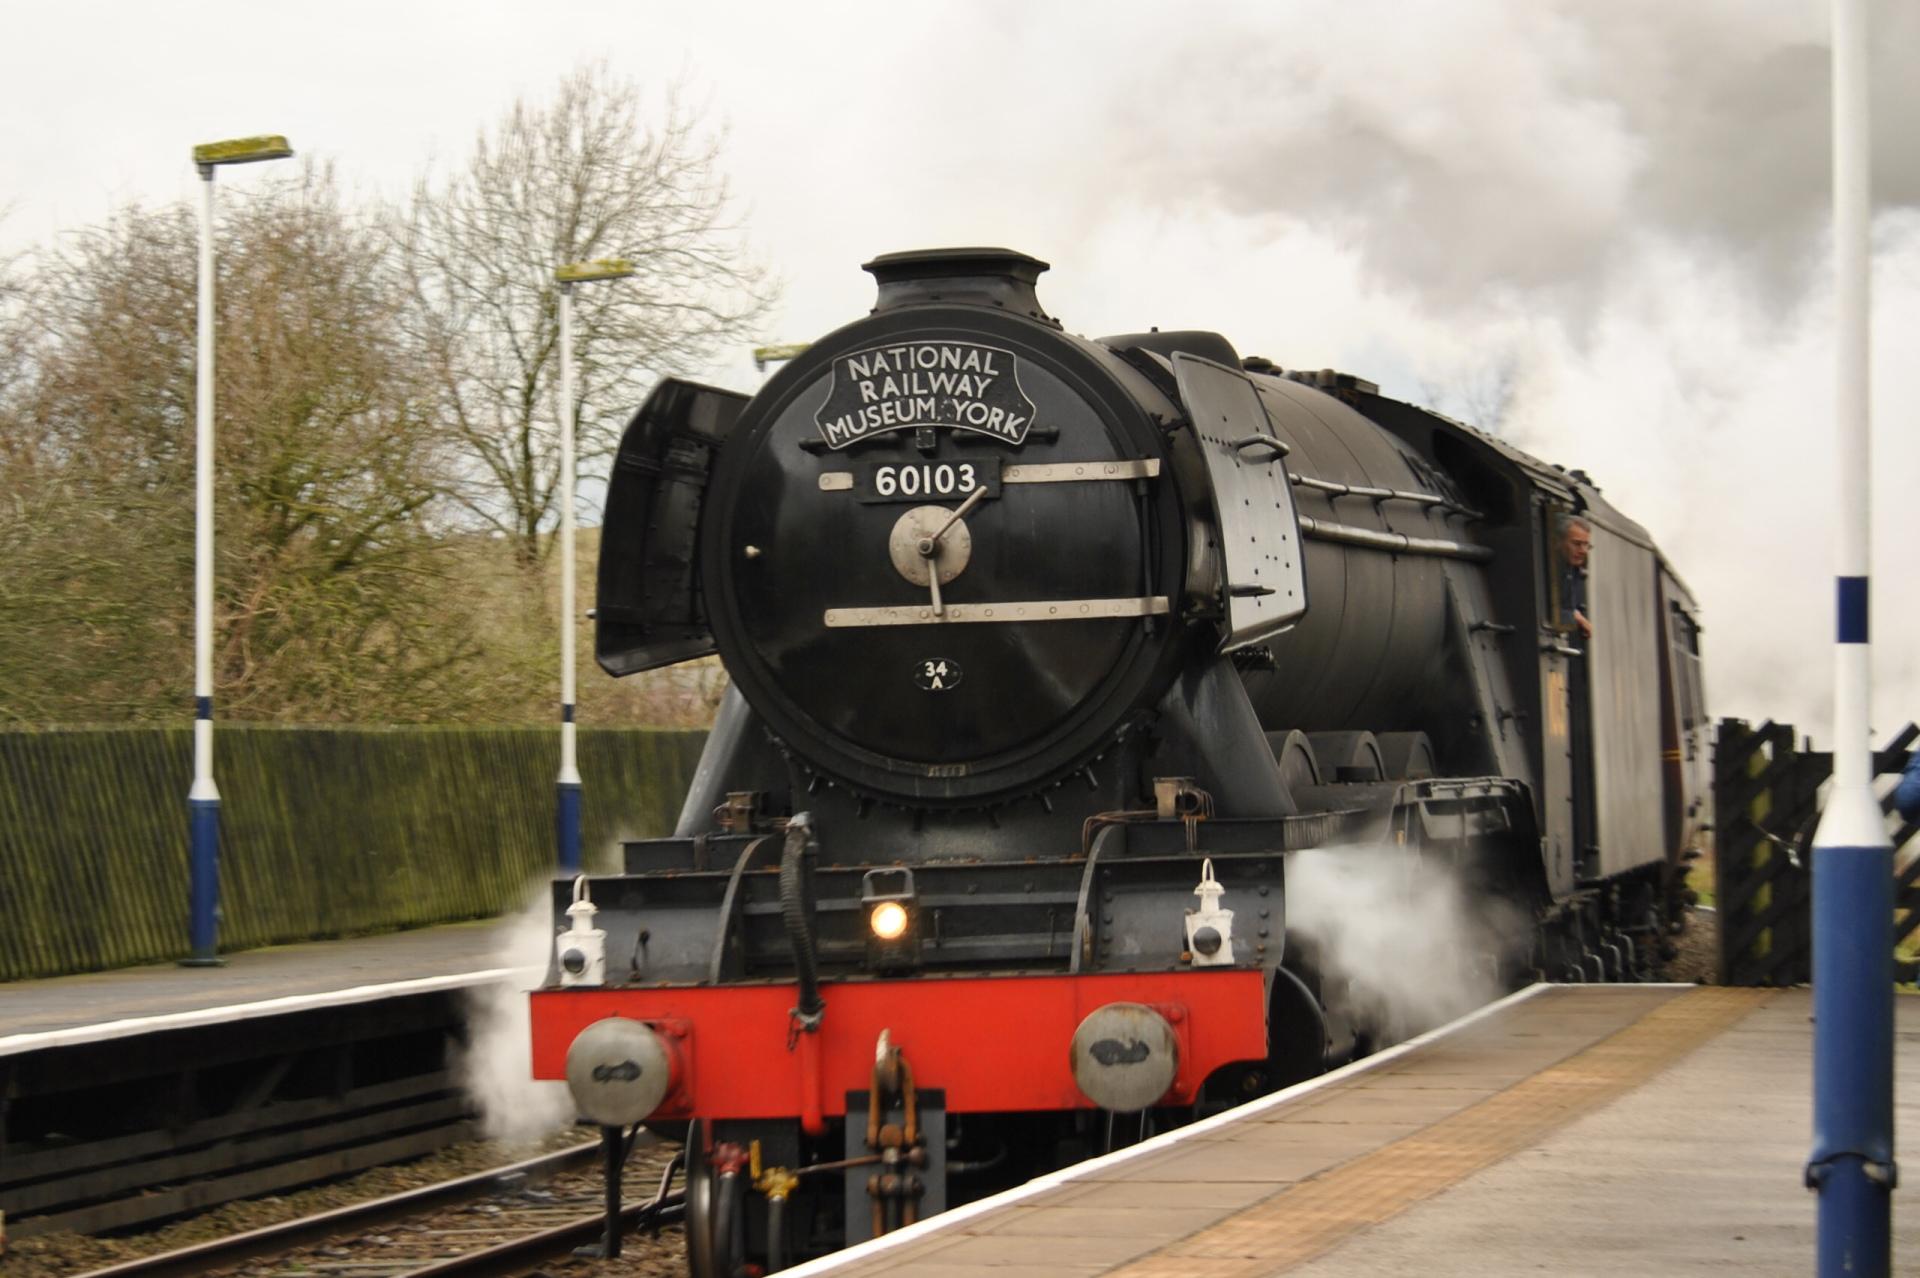 Flying scotsman, steam train, settle